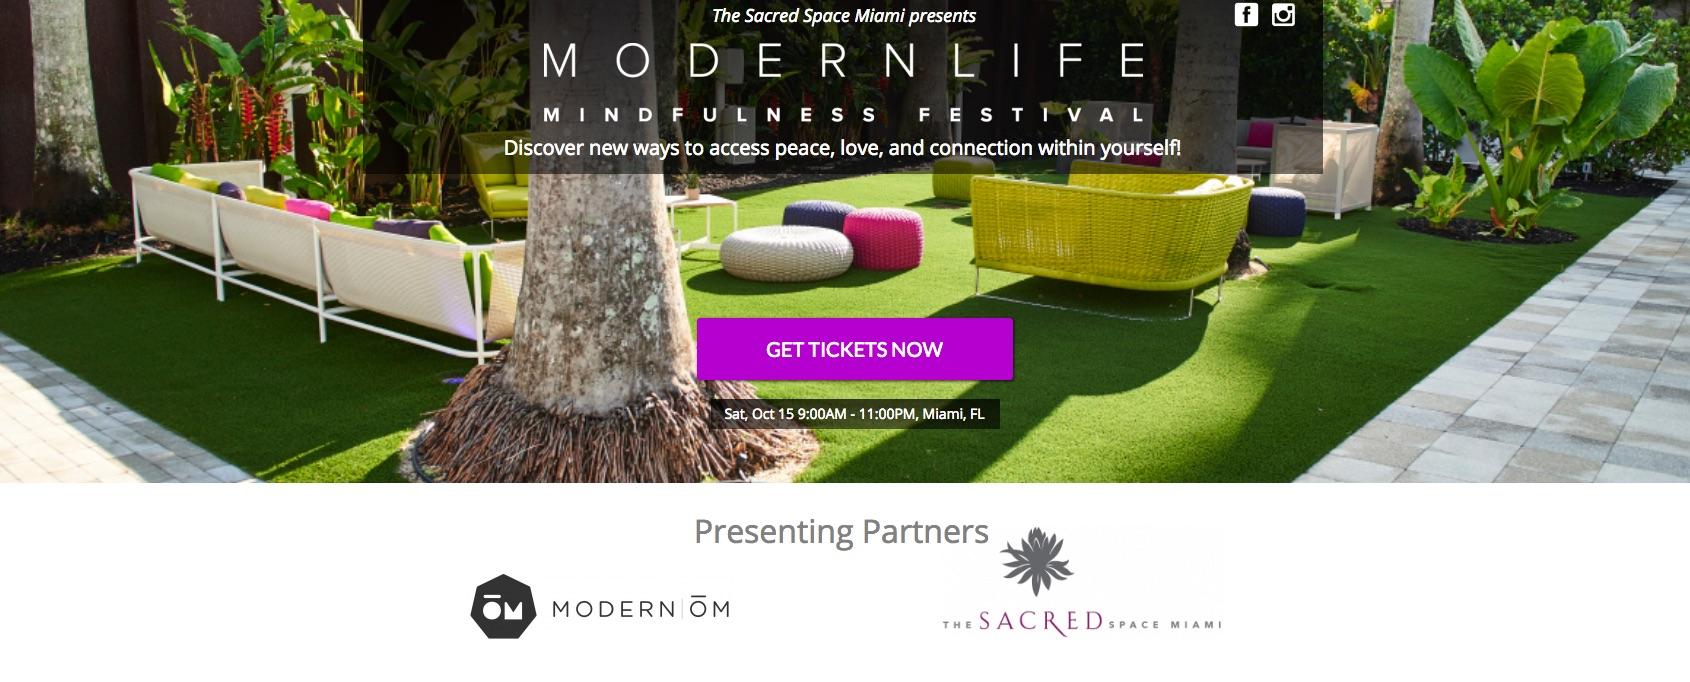 Modern Life Festival Miami The Sacred Space Modern OM - Get Ink PR